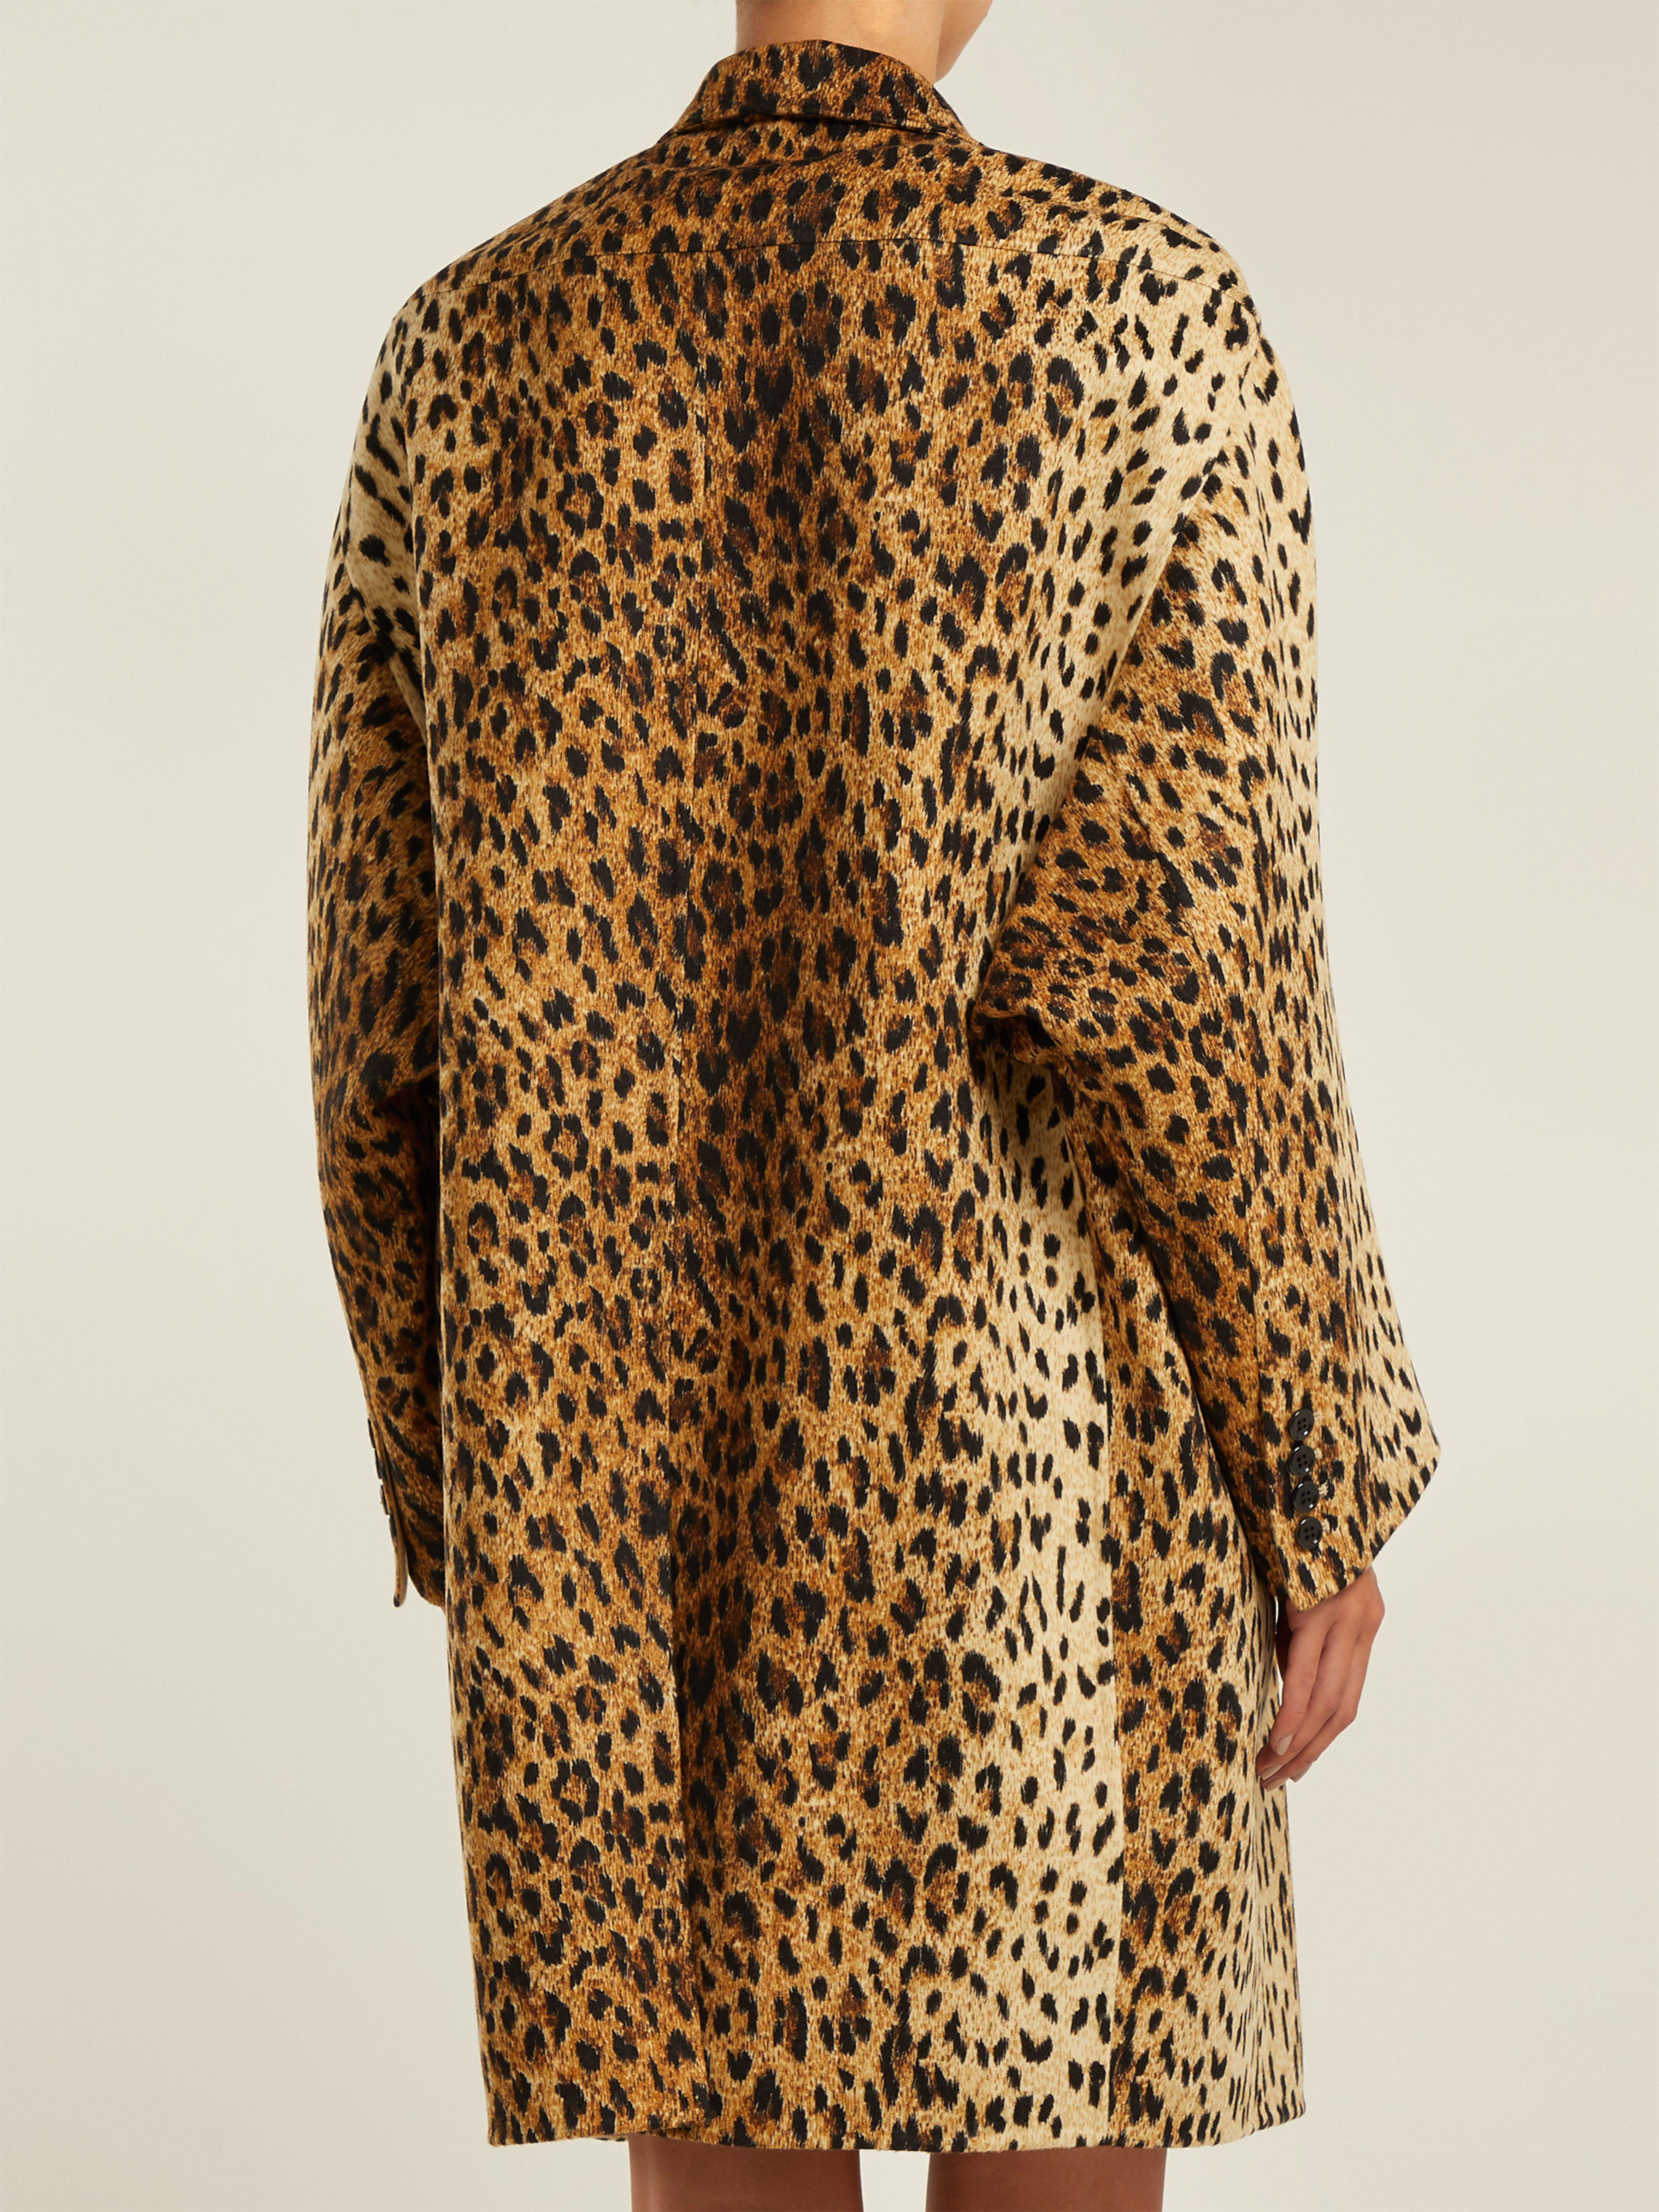 2a8304cf809 Valentino Leopard-print Wool-blend Coat in Brown - Lyst